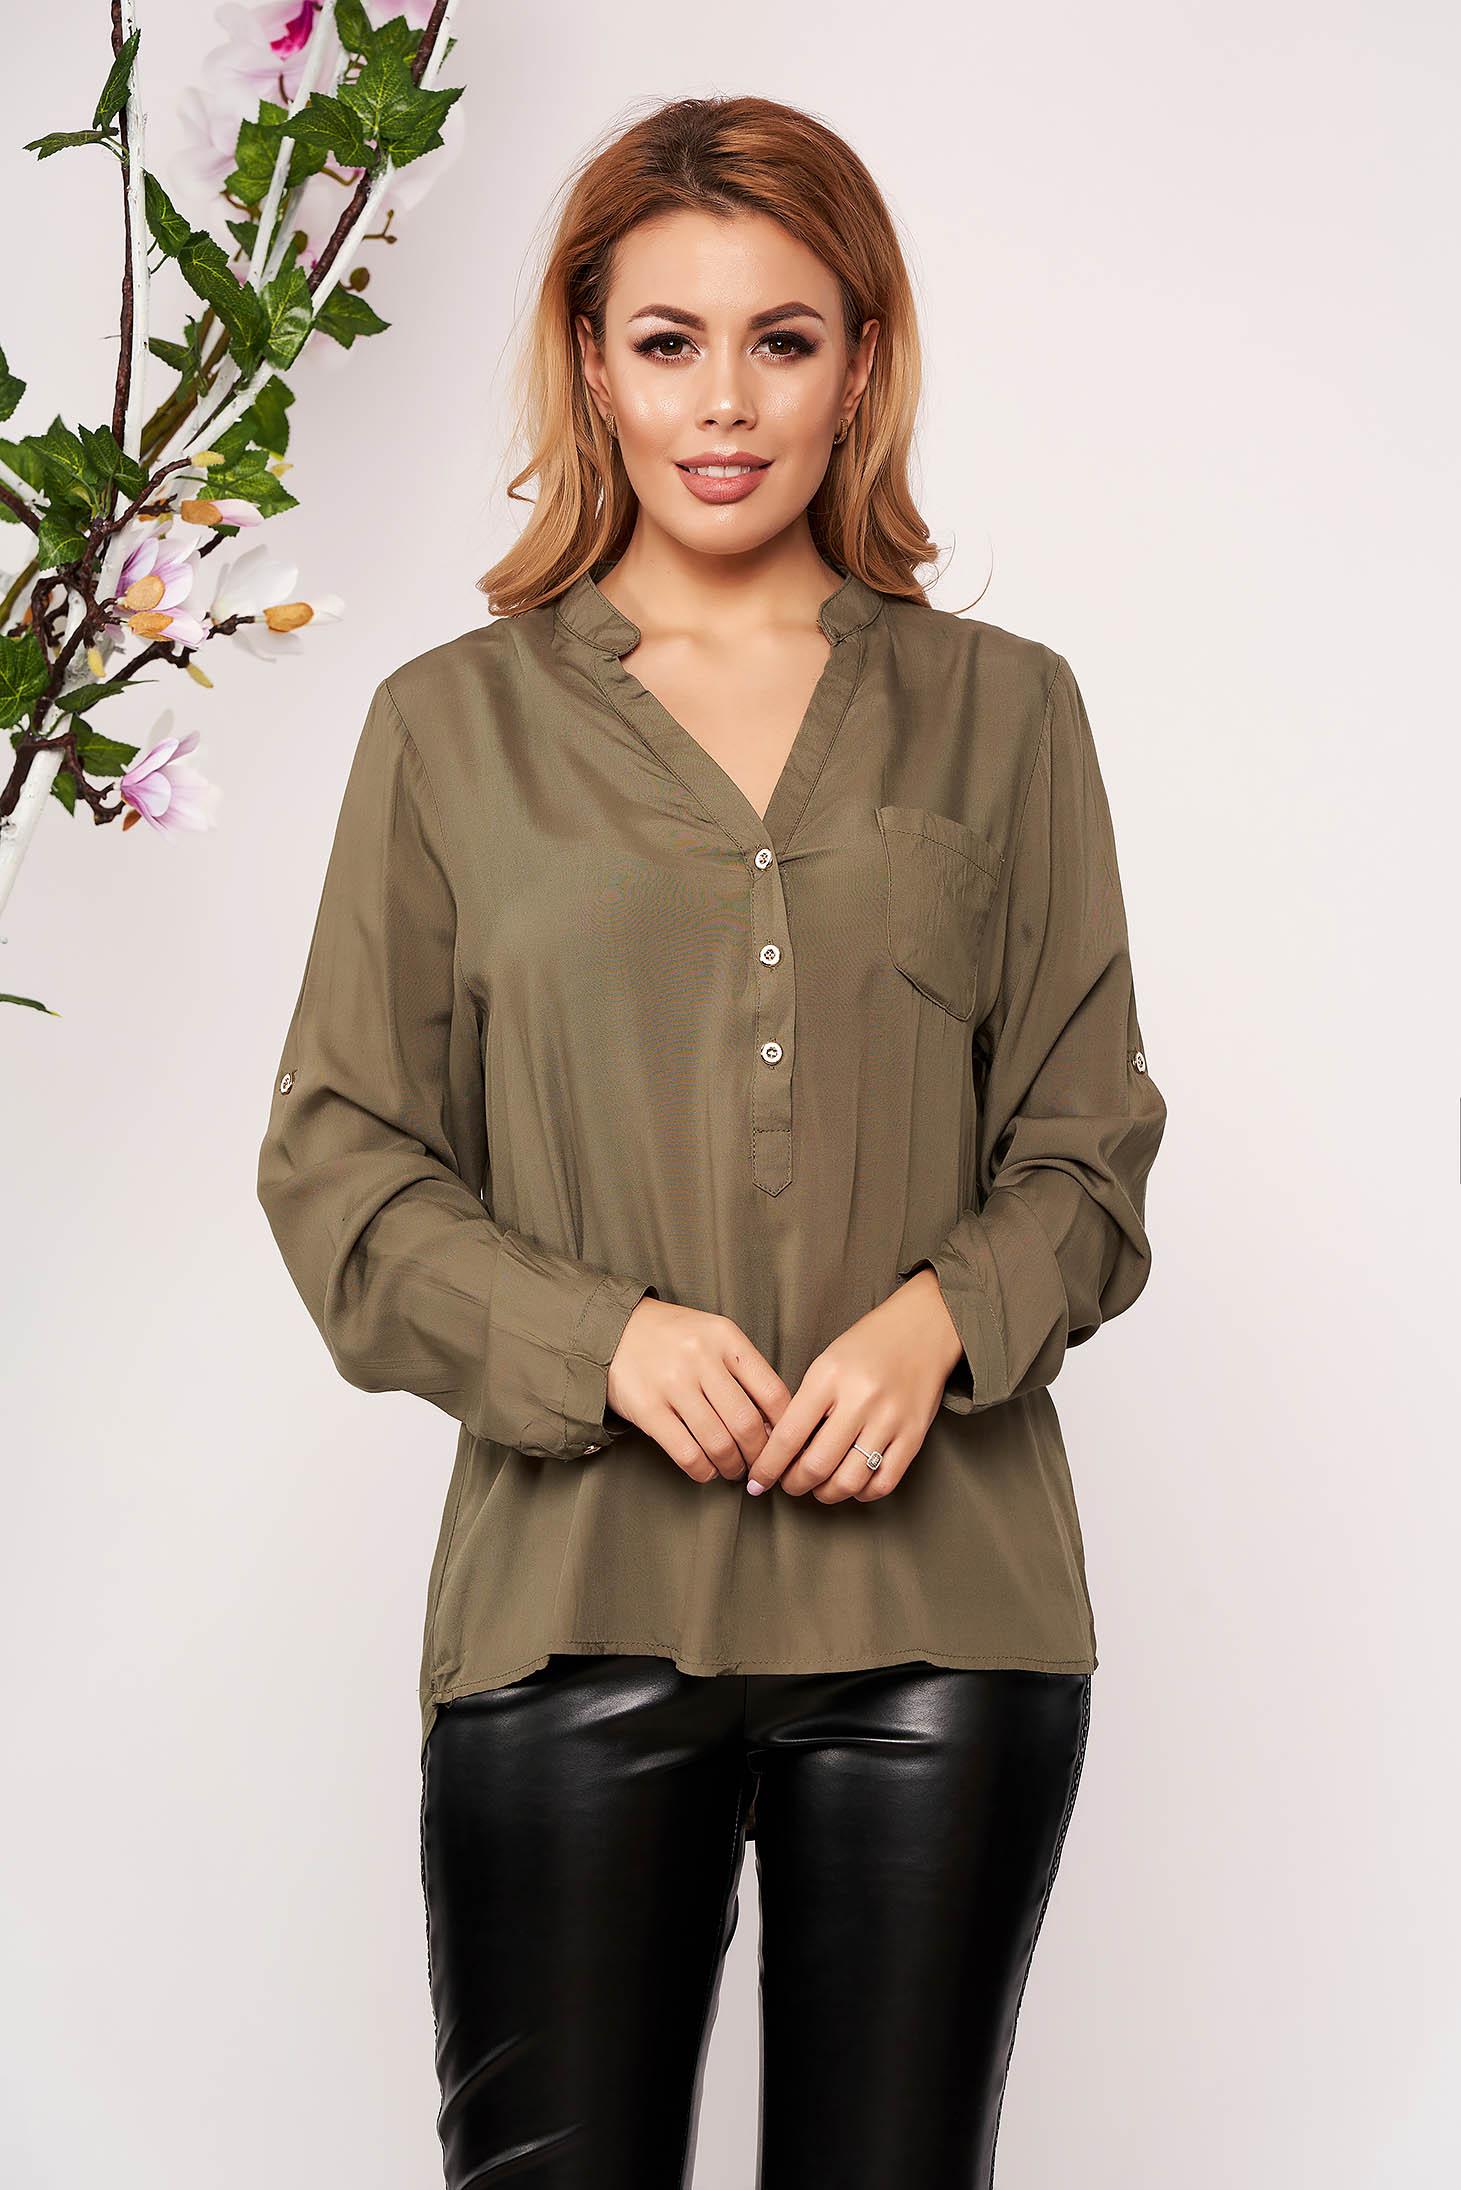 Green women`s shirt office short cut with v-neckline long sleeved thin fabric